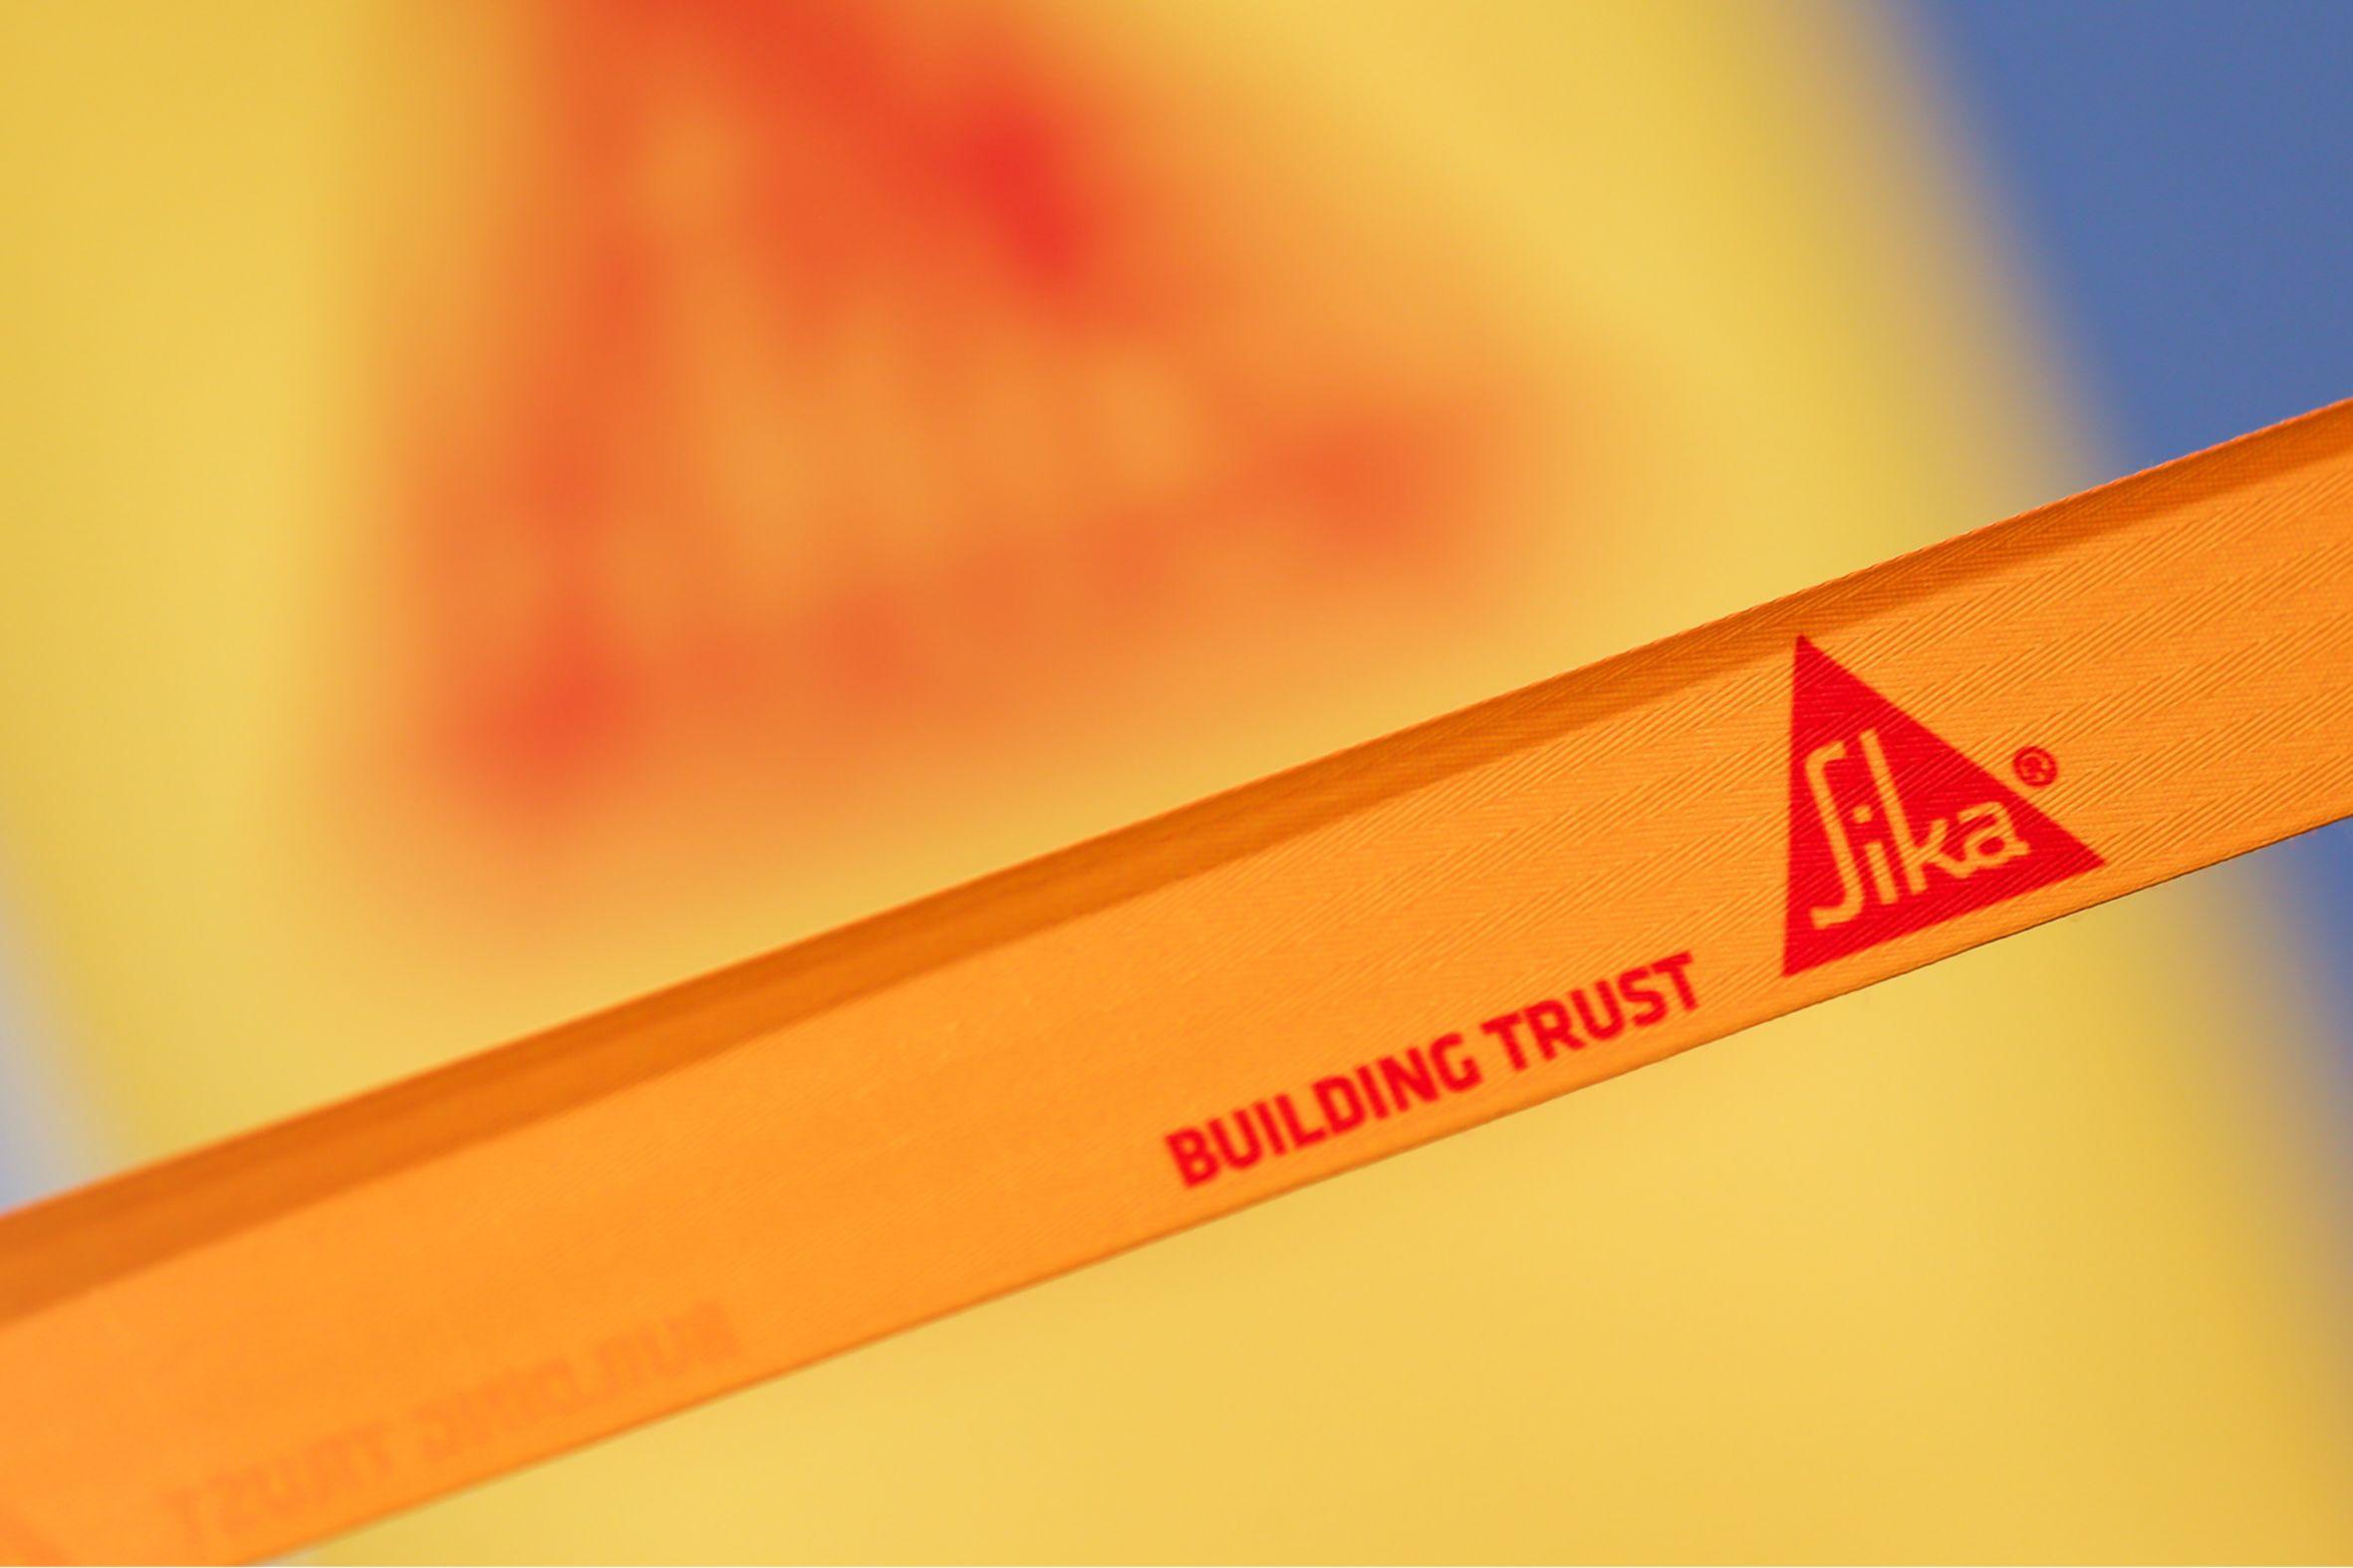 Sika Imagebild Building Trust